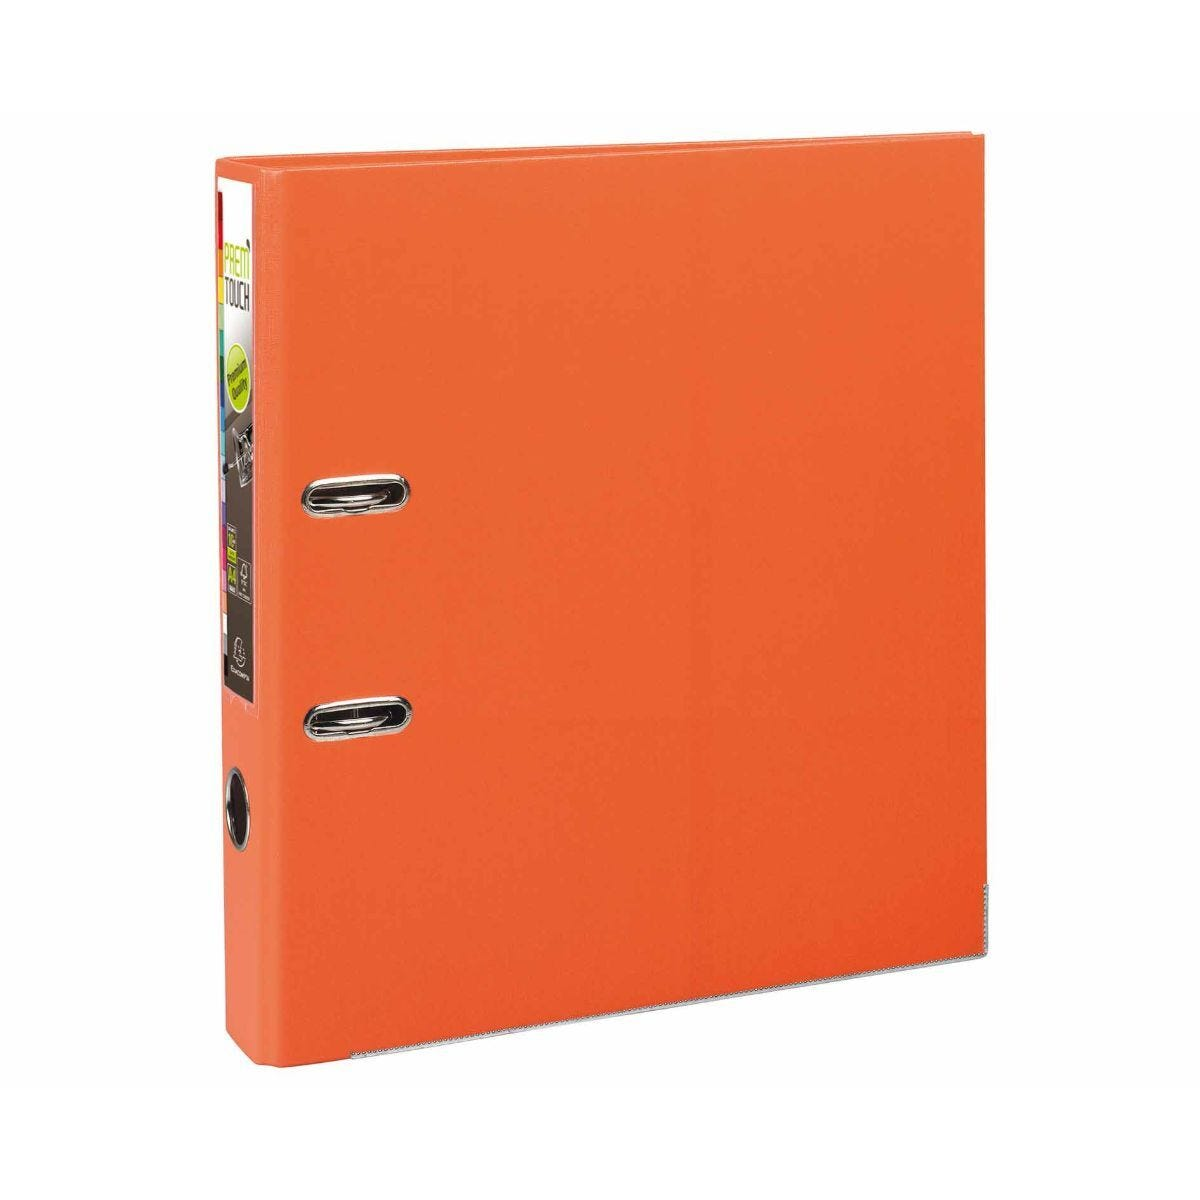 Exacompta PremTouch A4 Plus Lever Arch File 50mm Pack of 10 Orange